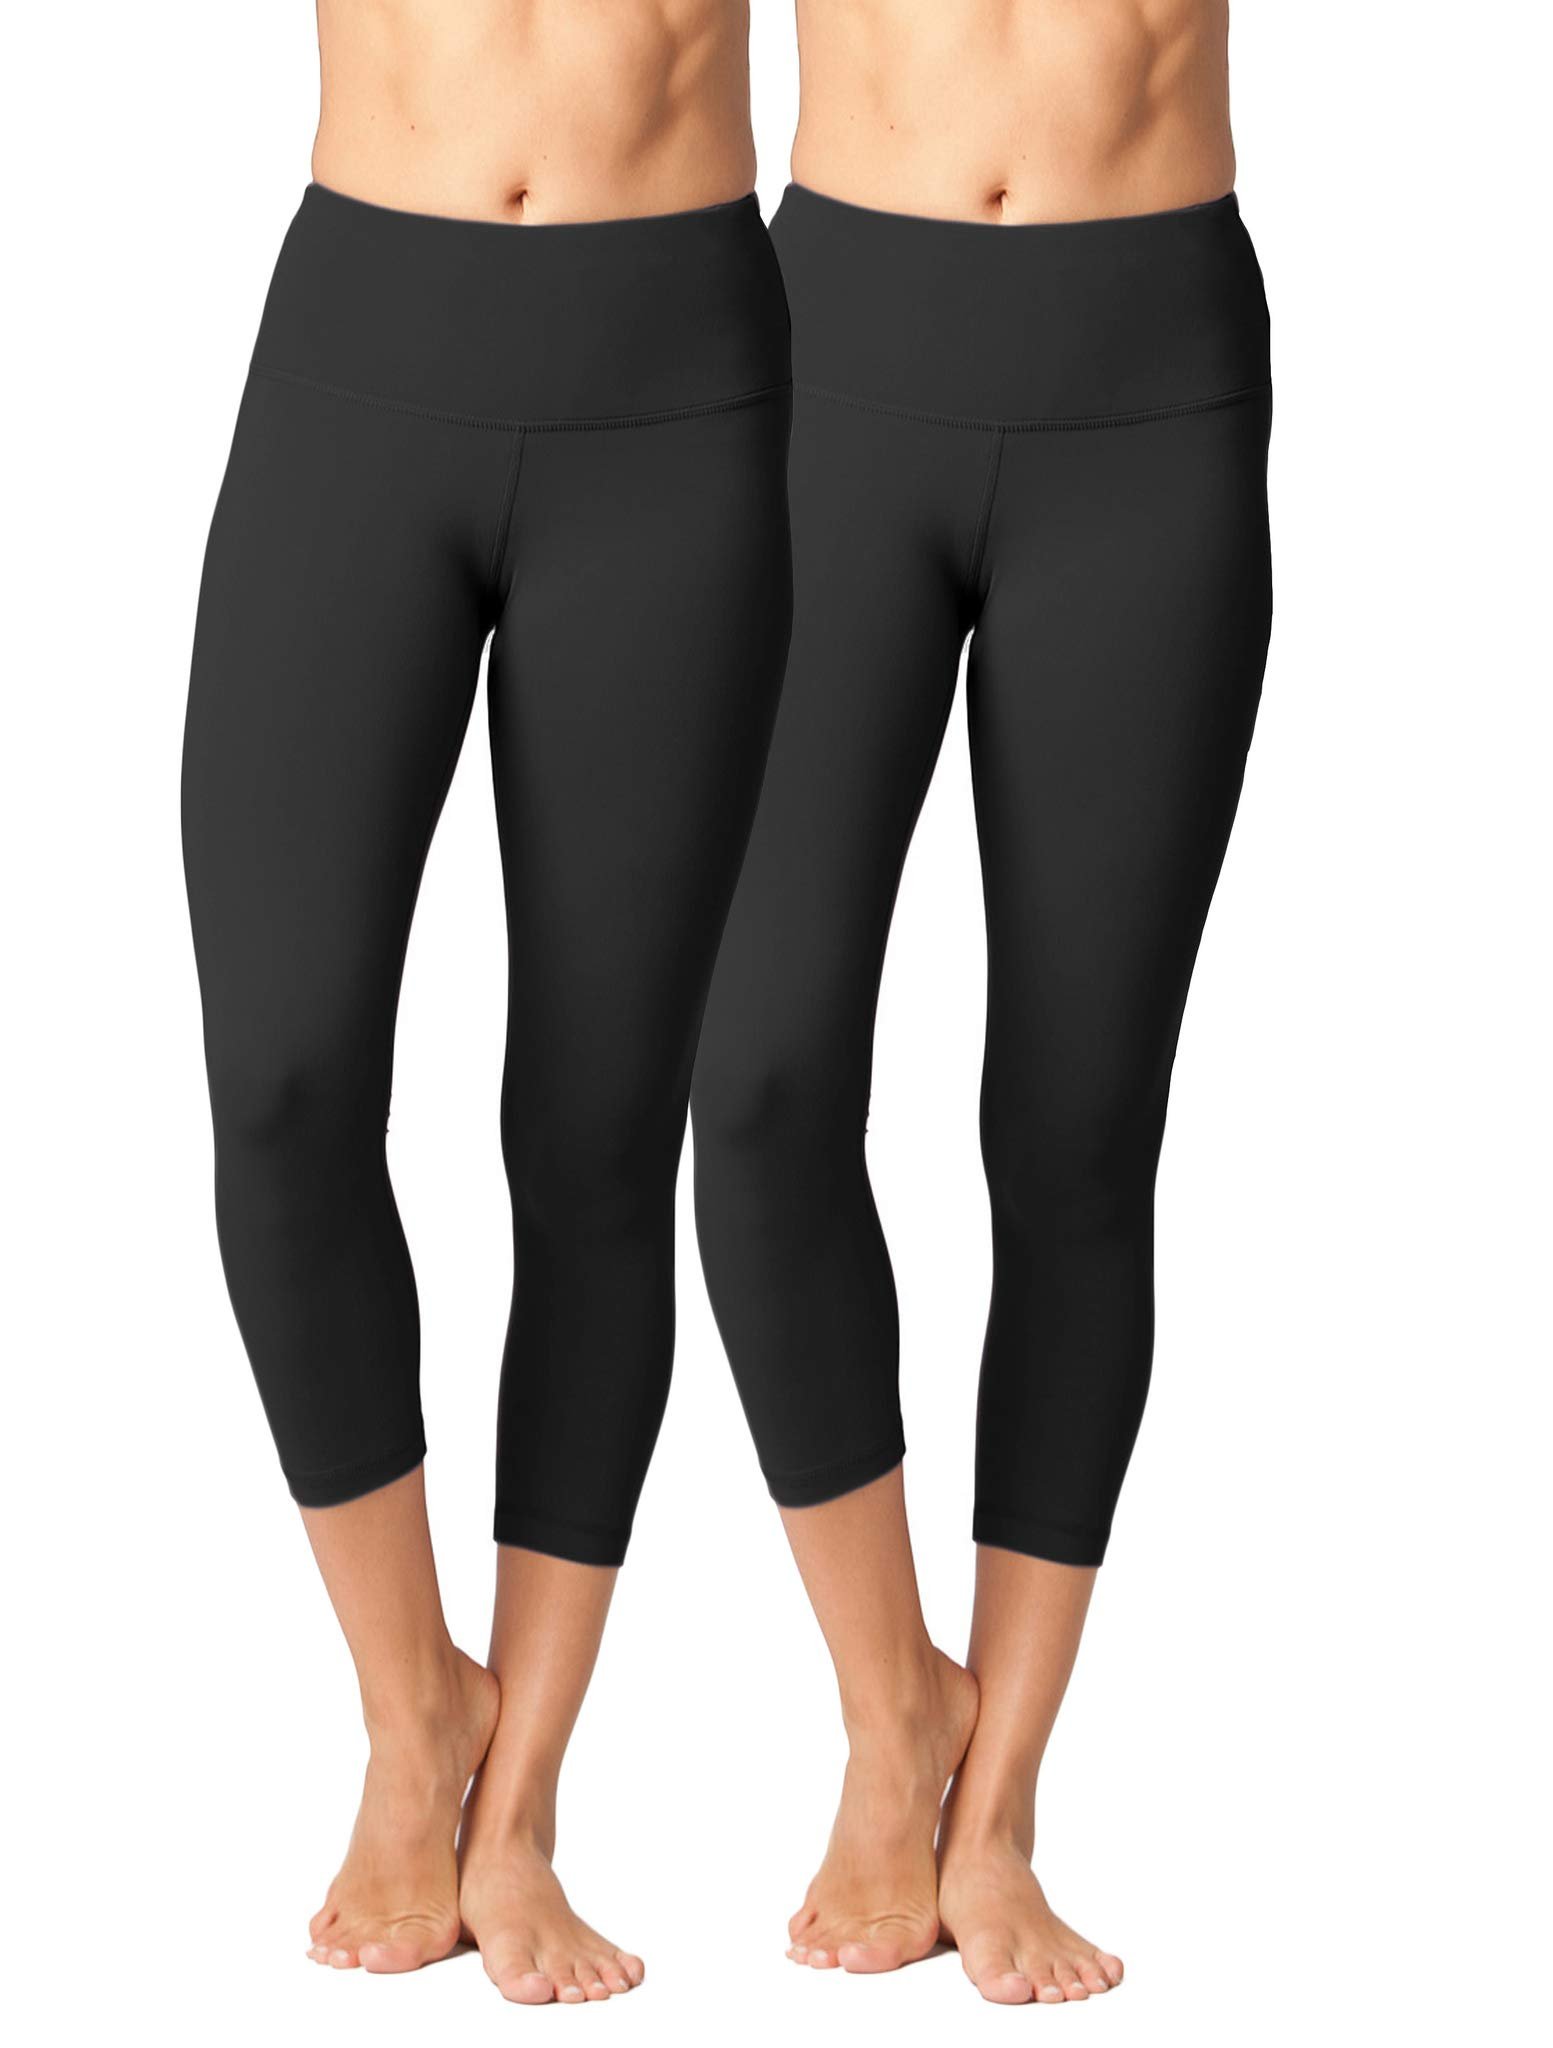 Yogalicious High Waist Ultra Soft Lightweight Capris - High Rise Yoga Pants (XS, Black 2 Pack)